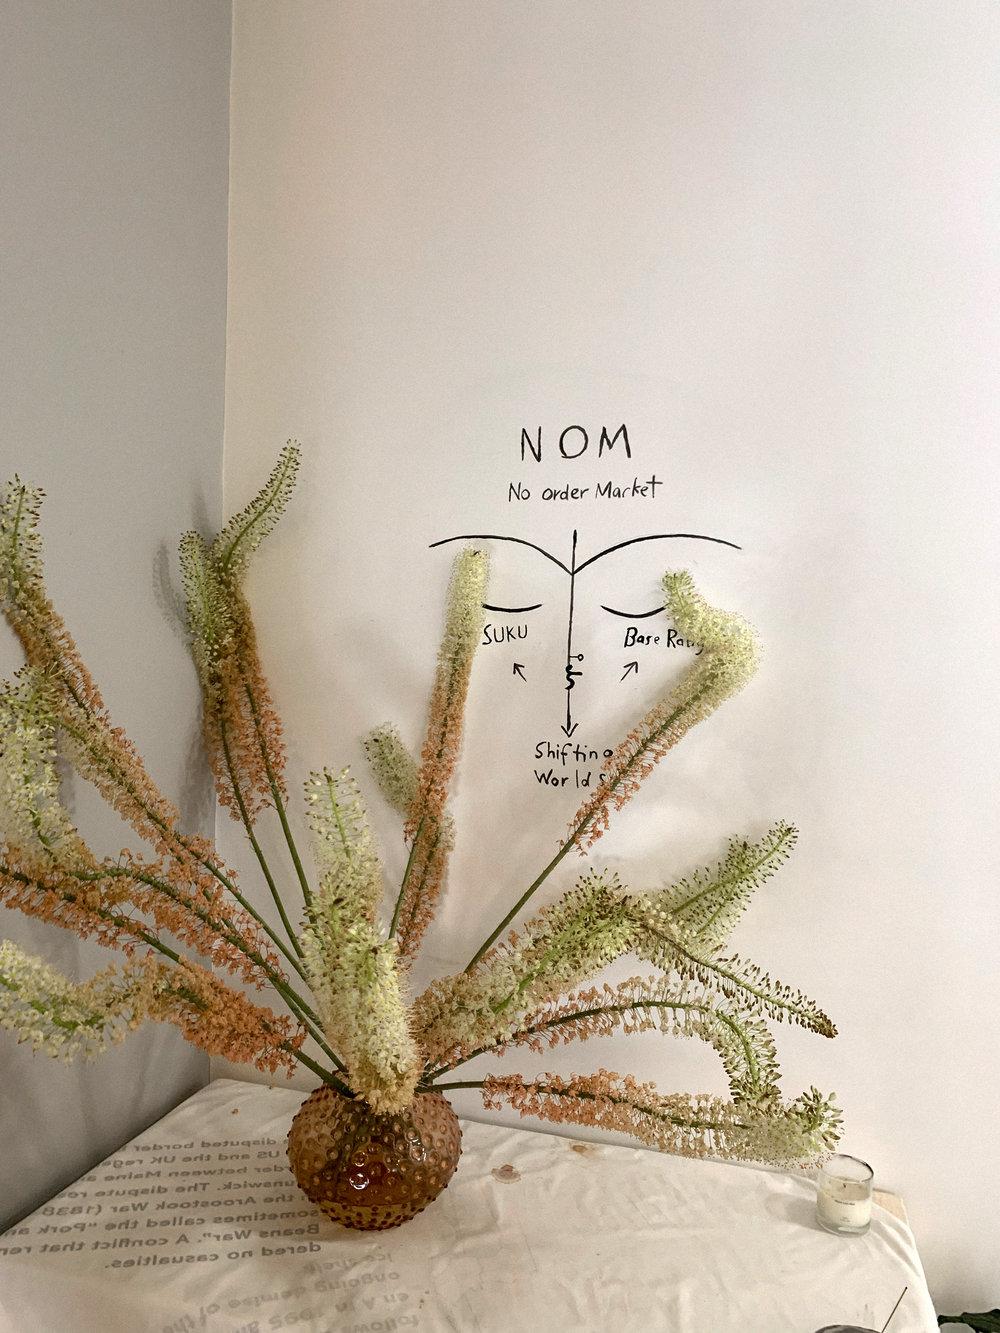 N.O.M - No Order Market